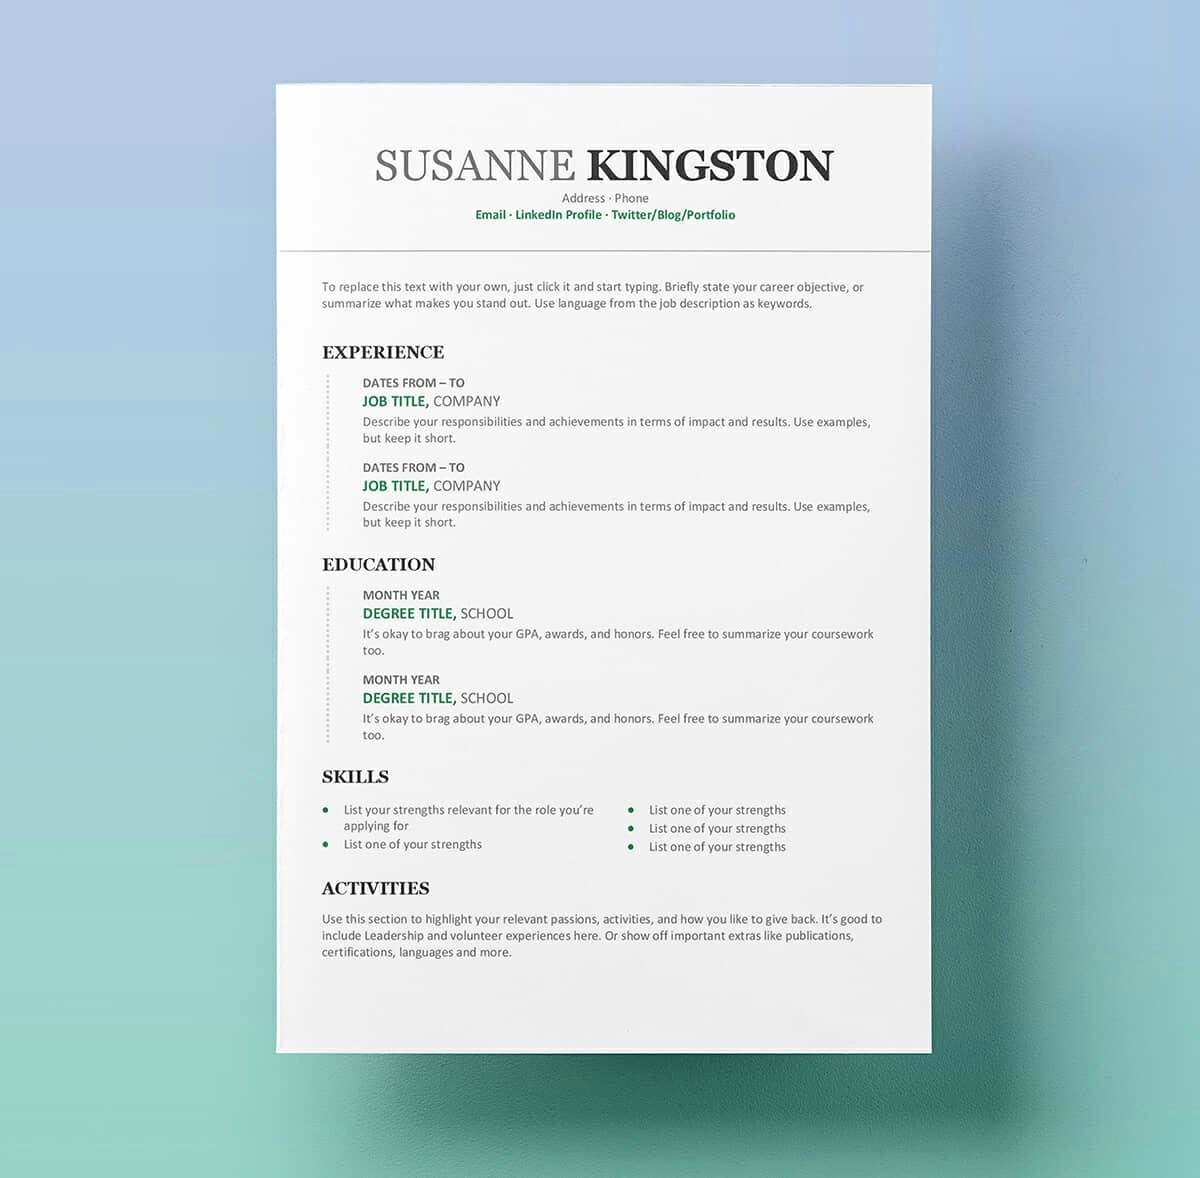 Resume Templates Microsoft Word Free Unique Resume Templates for Word Free 15 Examples for Download